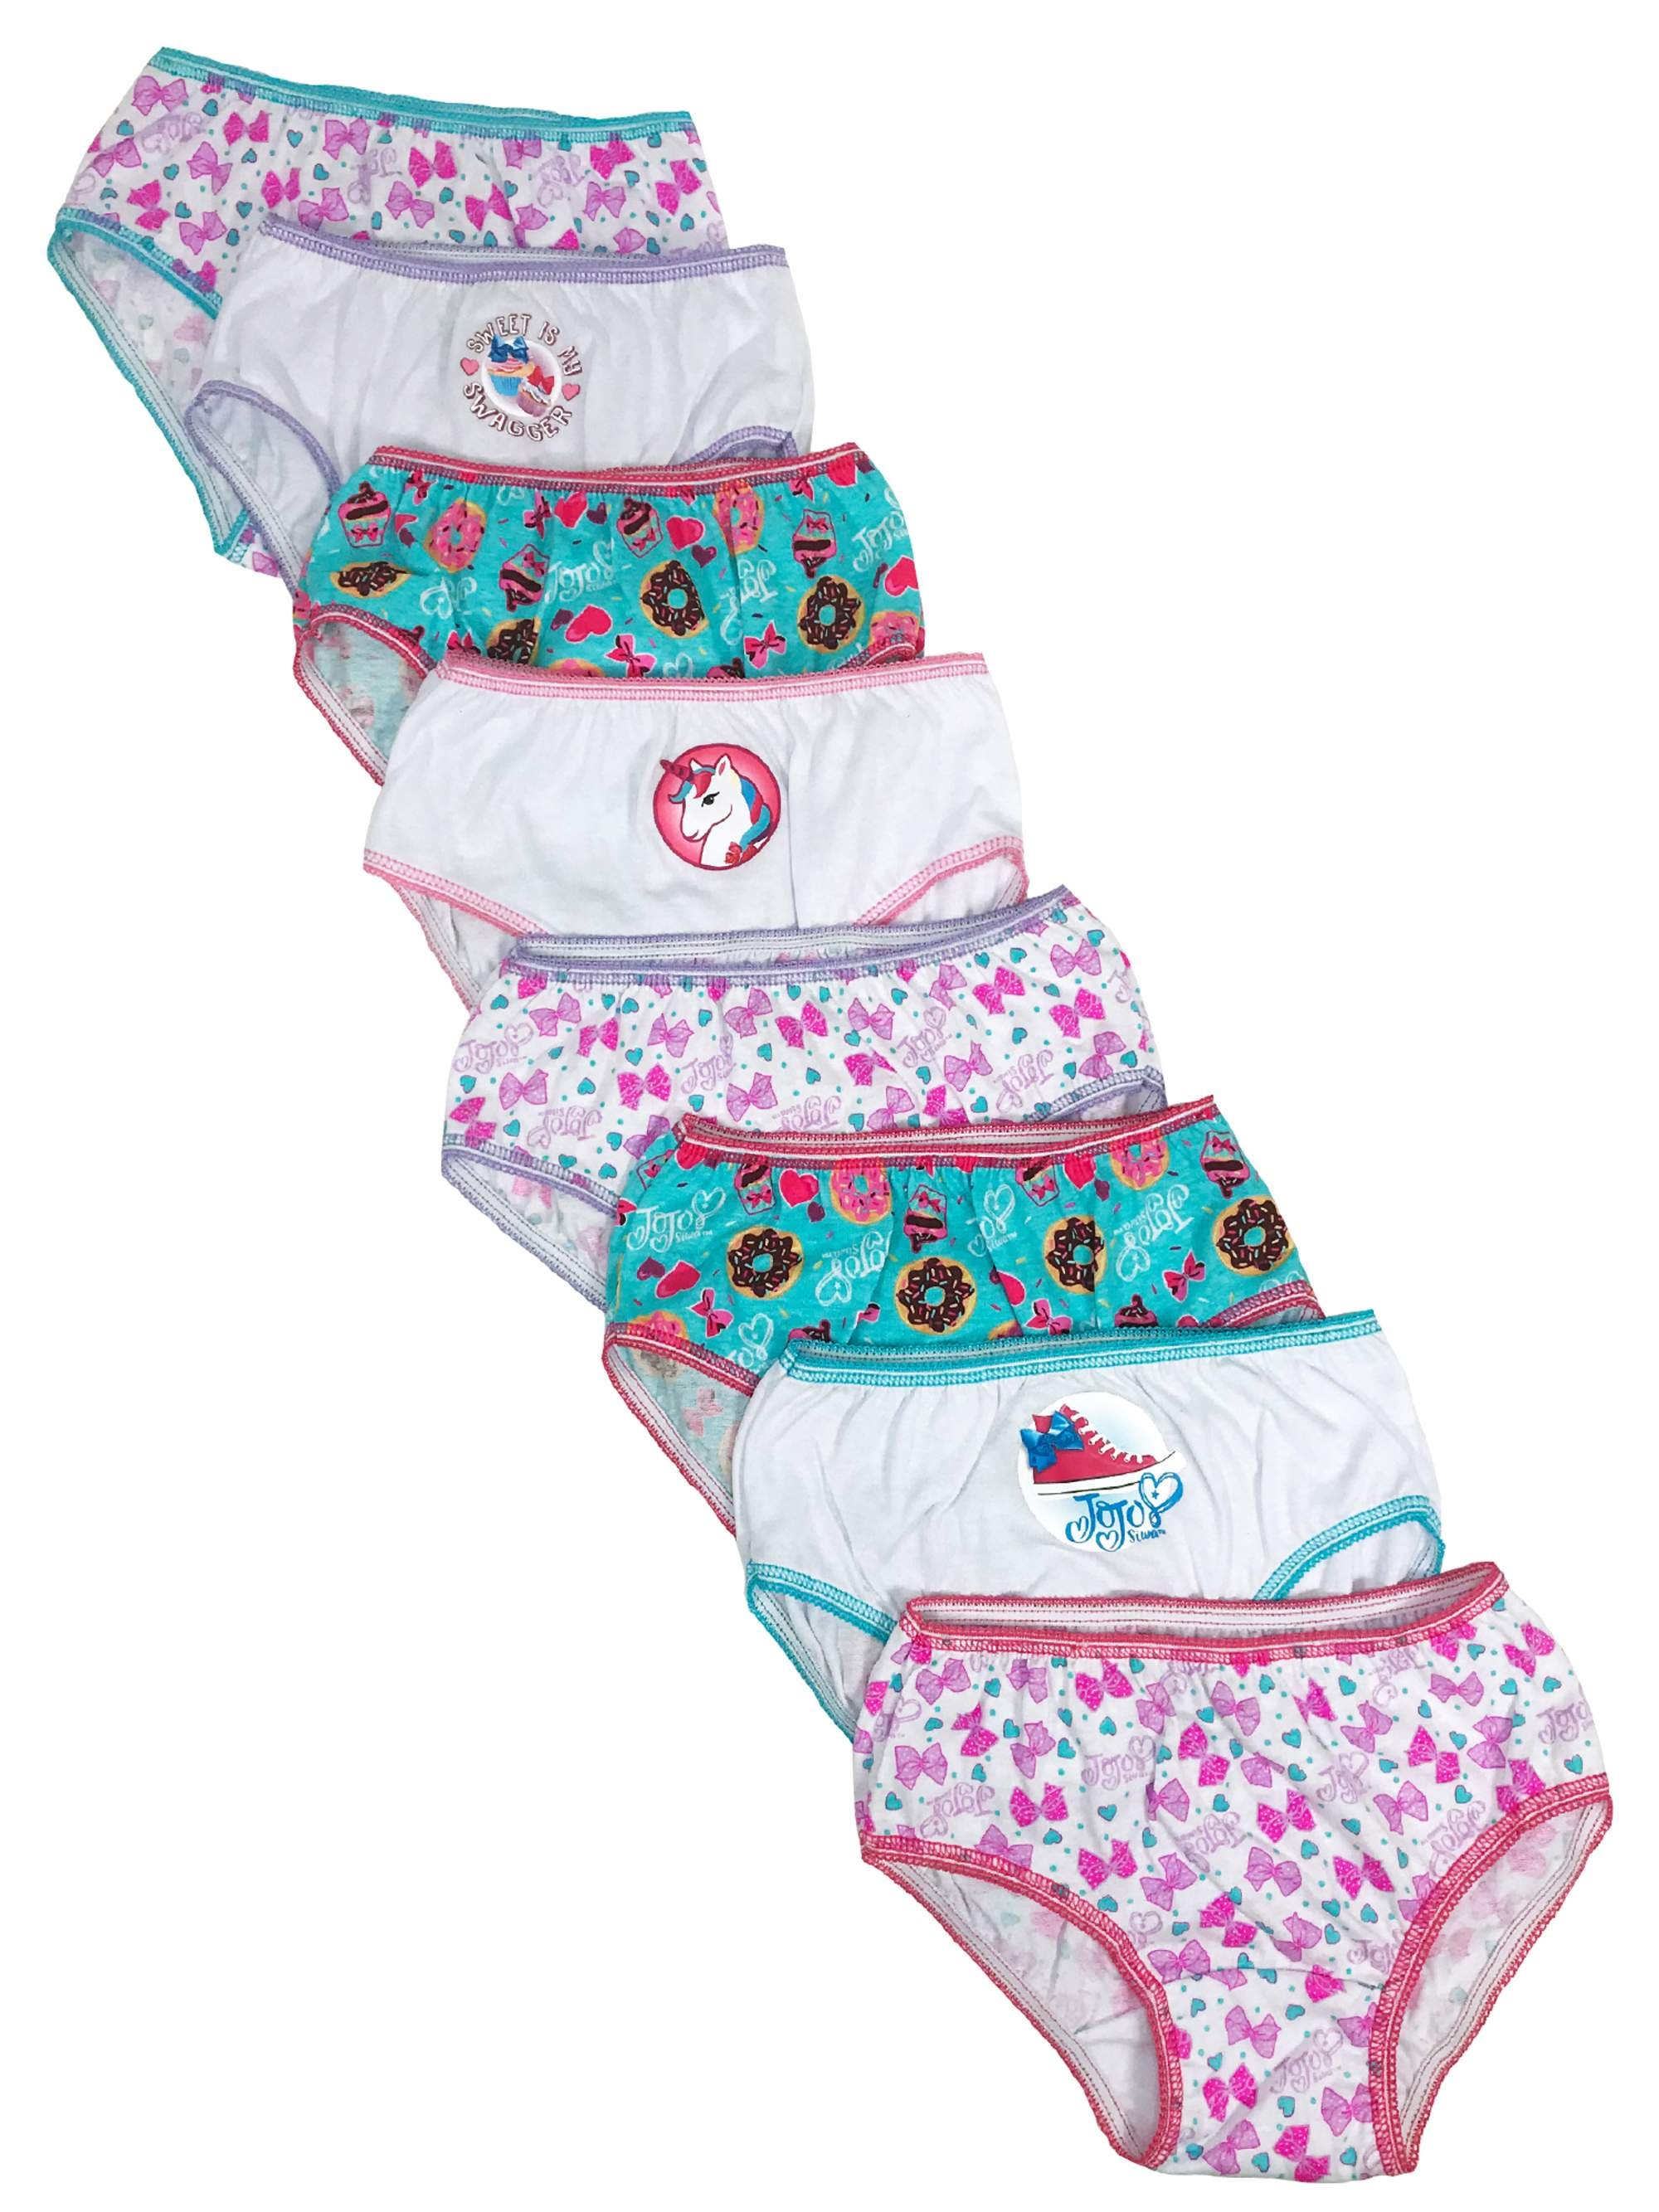 Girls Character 8 Pack Underwear